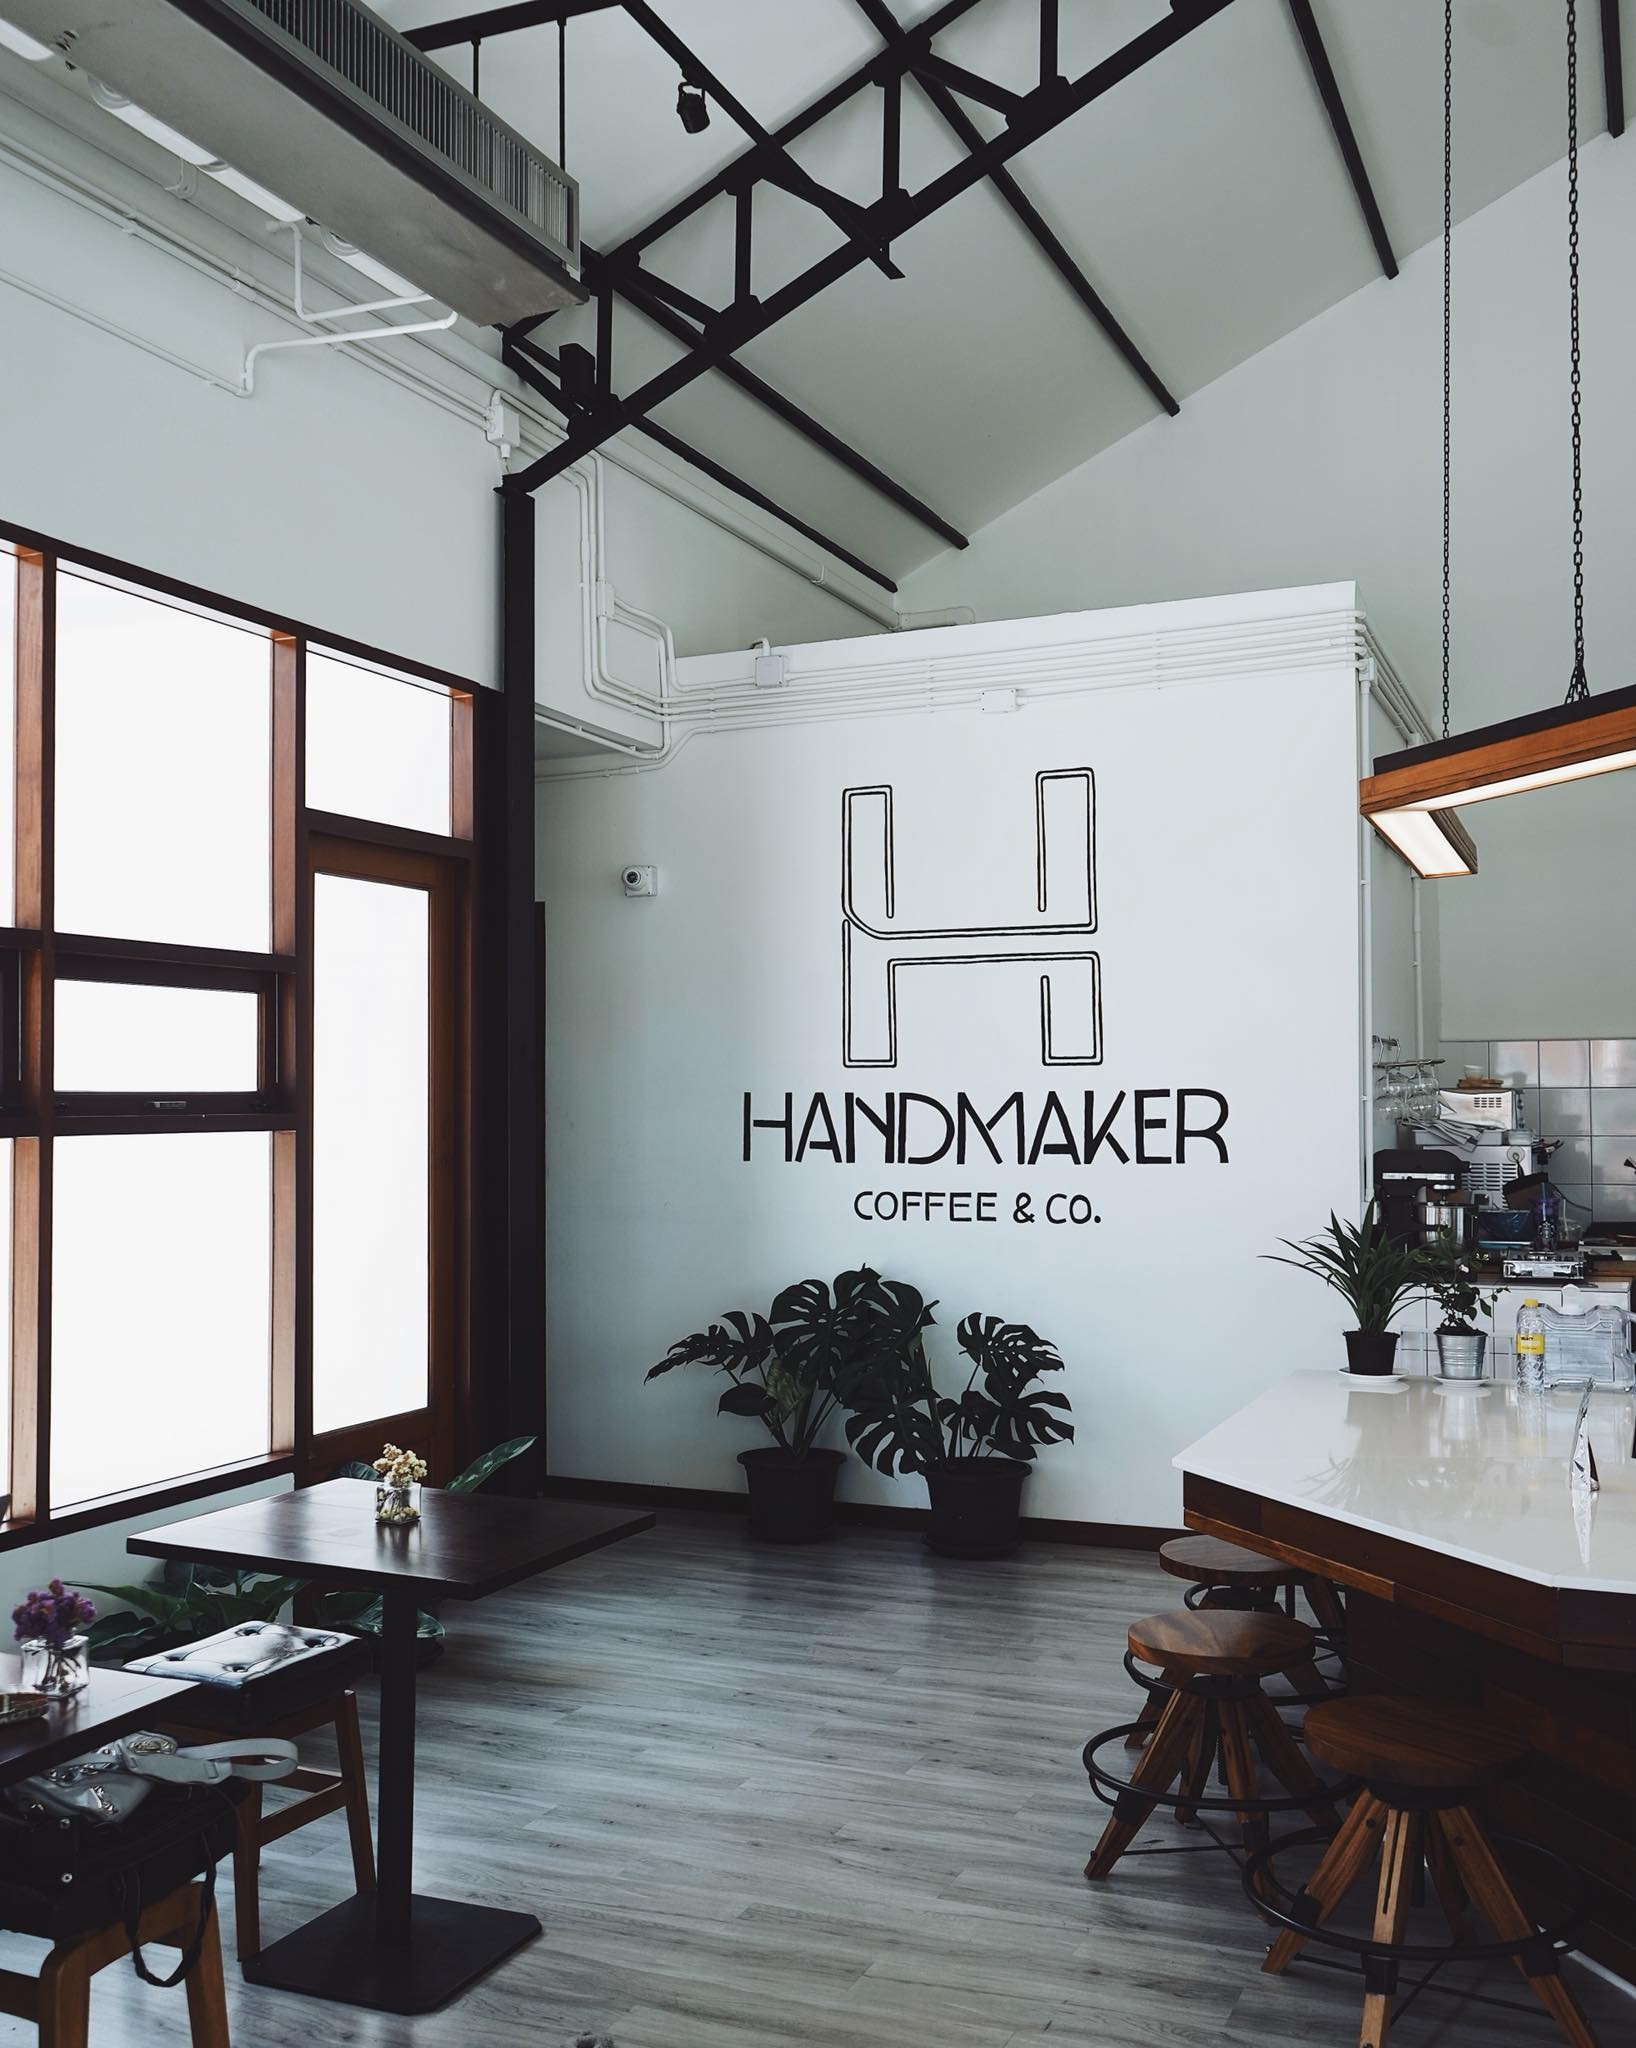 Handmaker Coffee & Co. ราชพฤกษ์